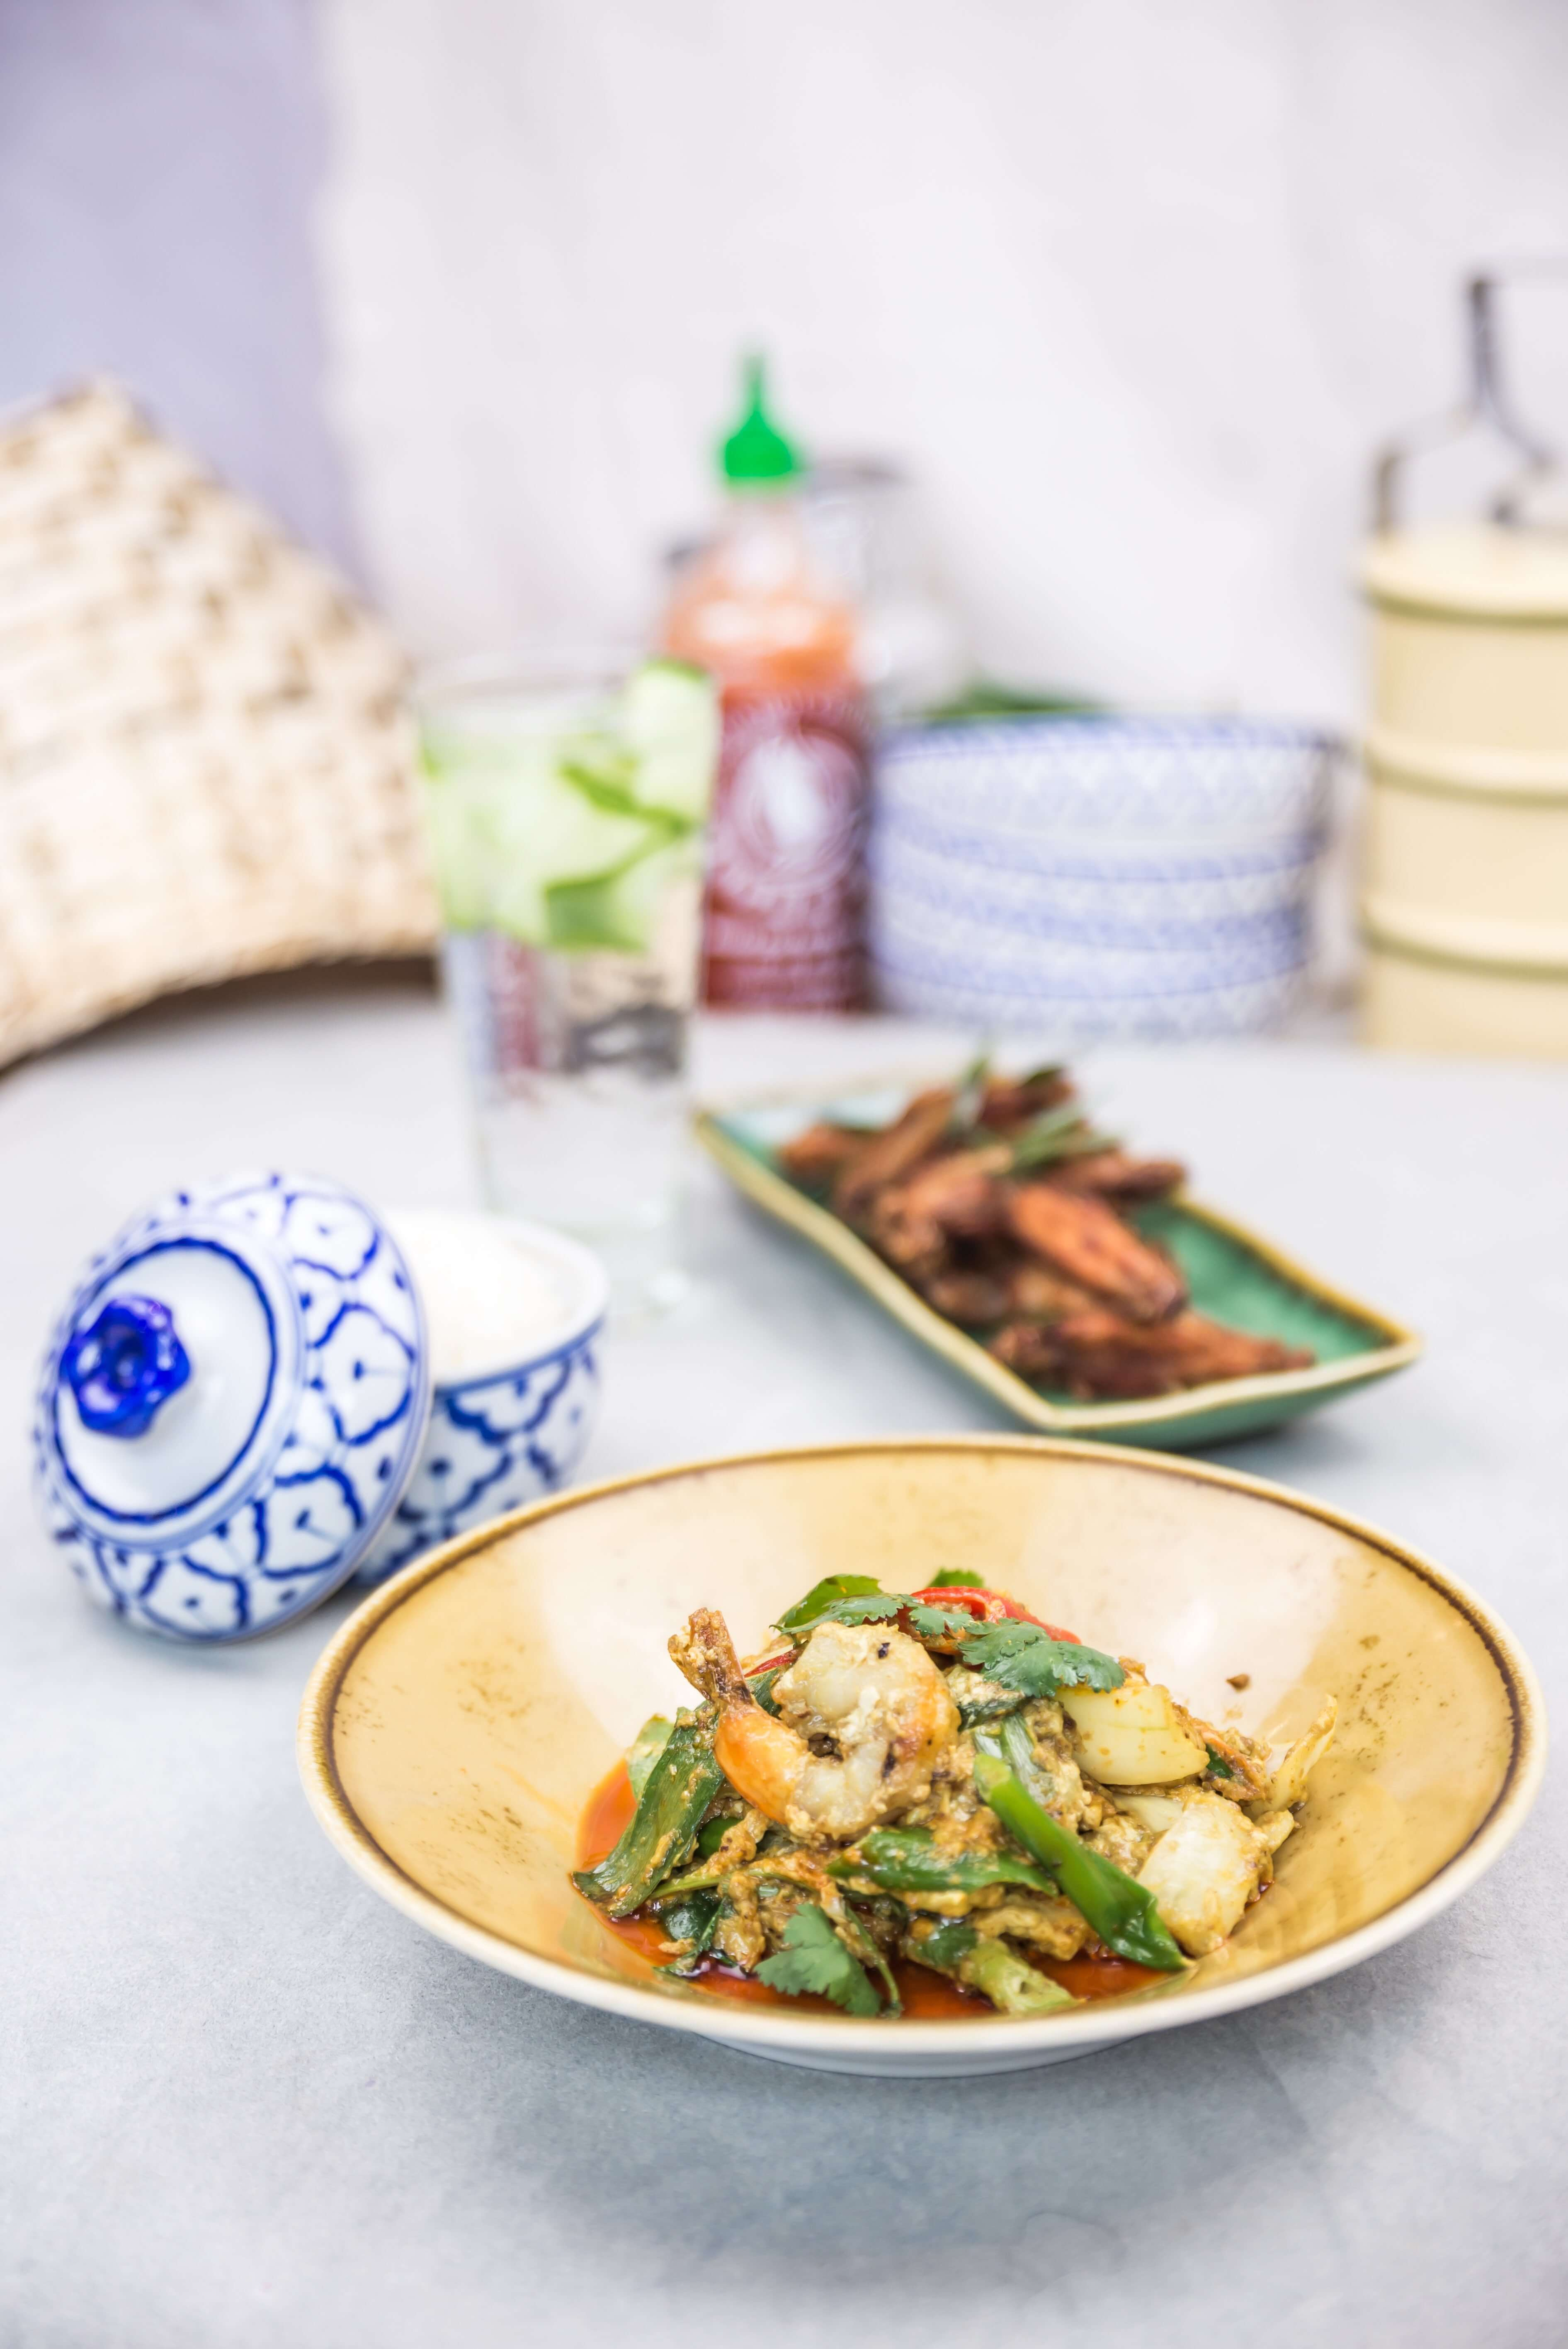 Busaba - prawn and asparagus